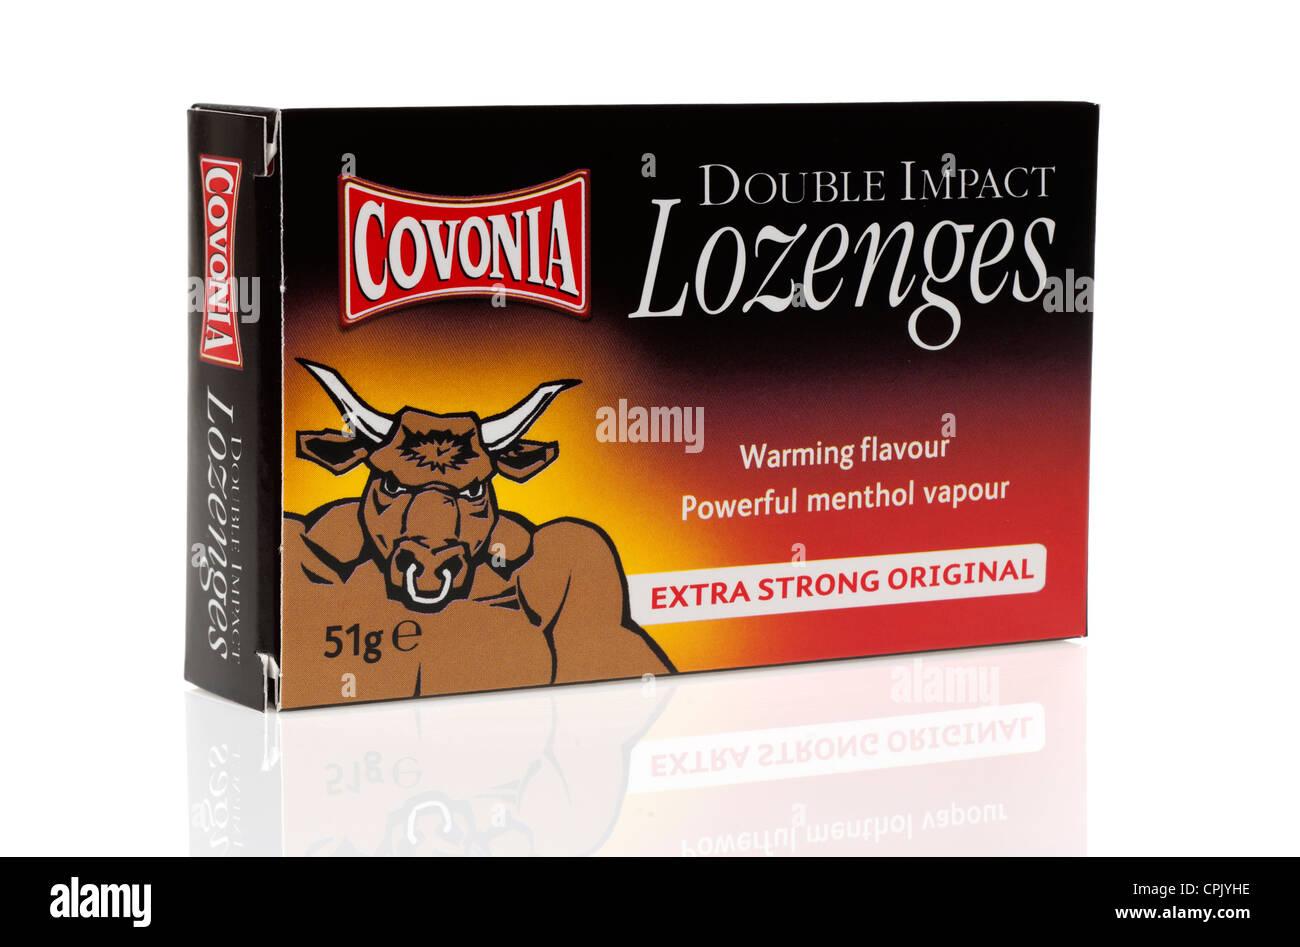 Box of Covonia double impact lozenges - Stock Image